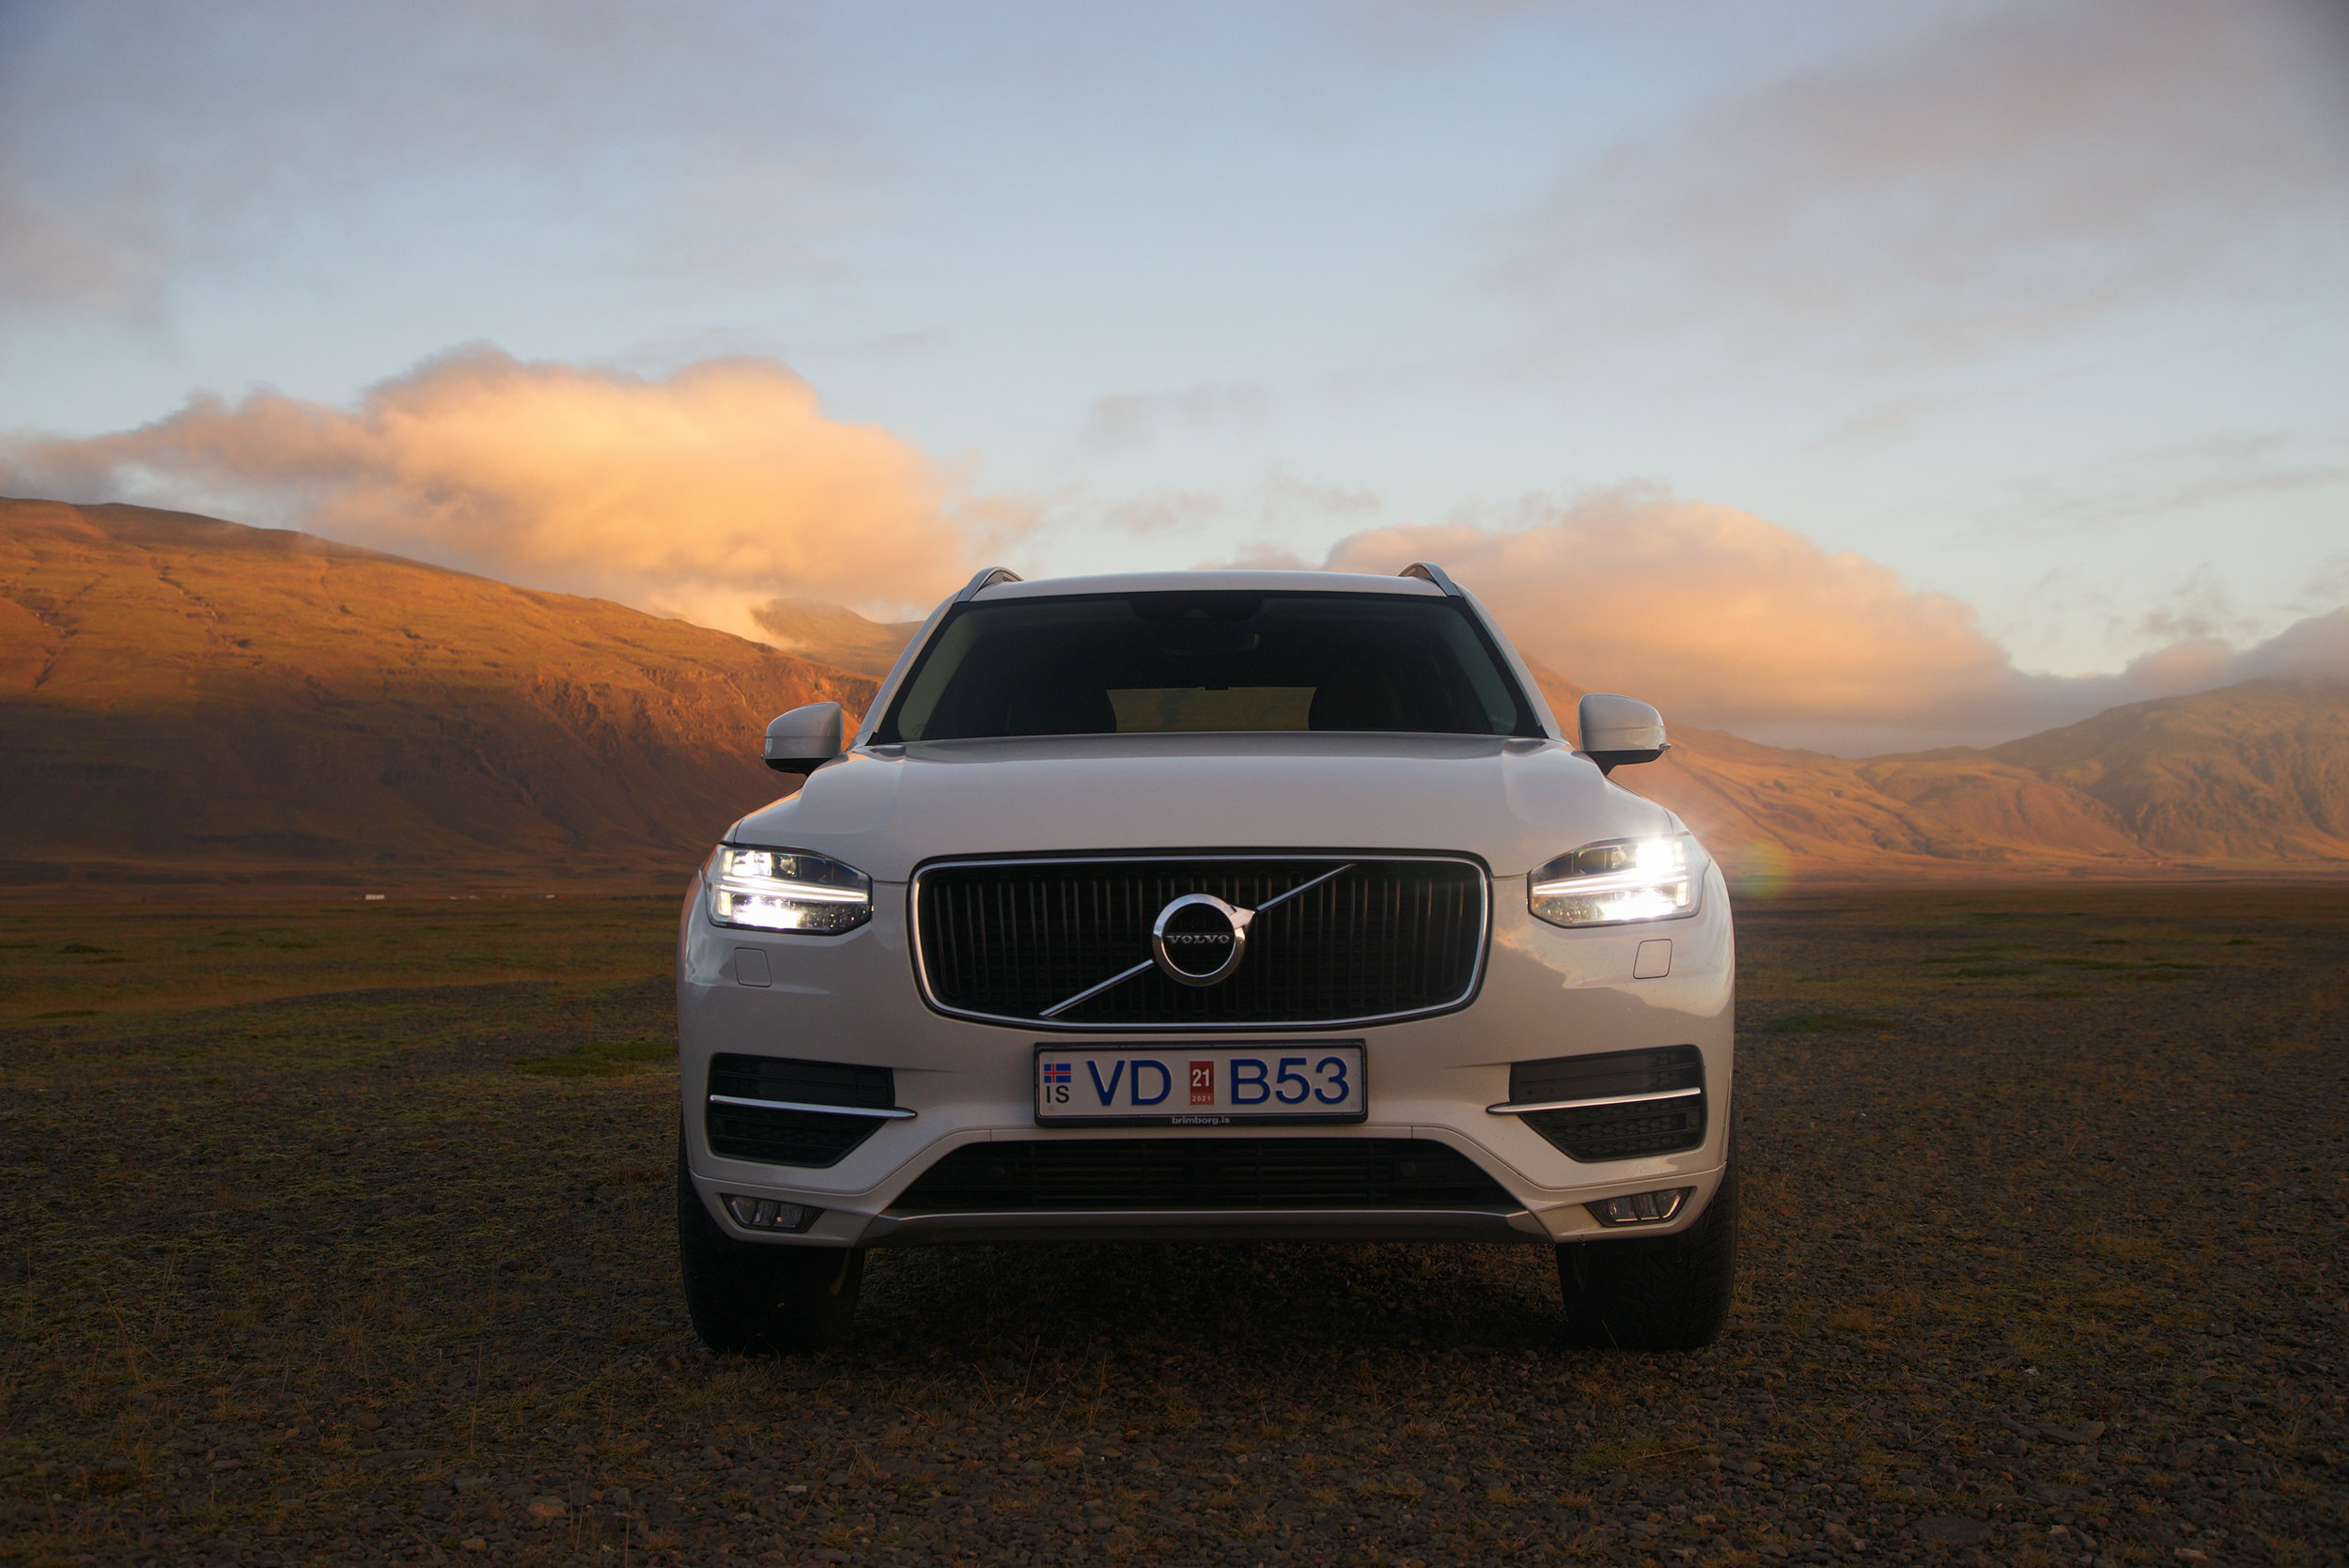 Volvo_XC90_Iceland_Sunset&Mountains.jpg